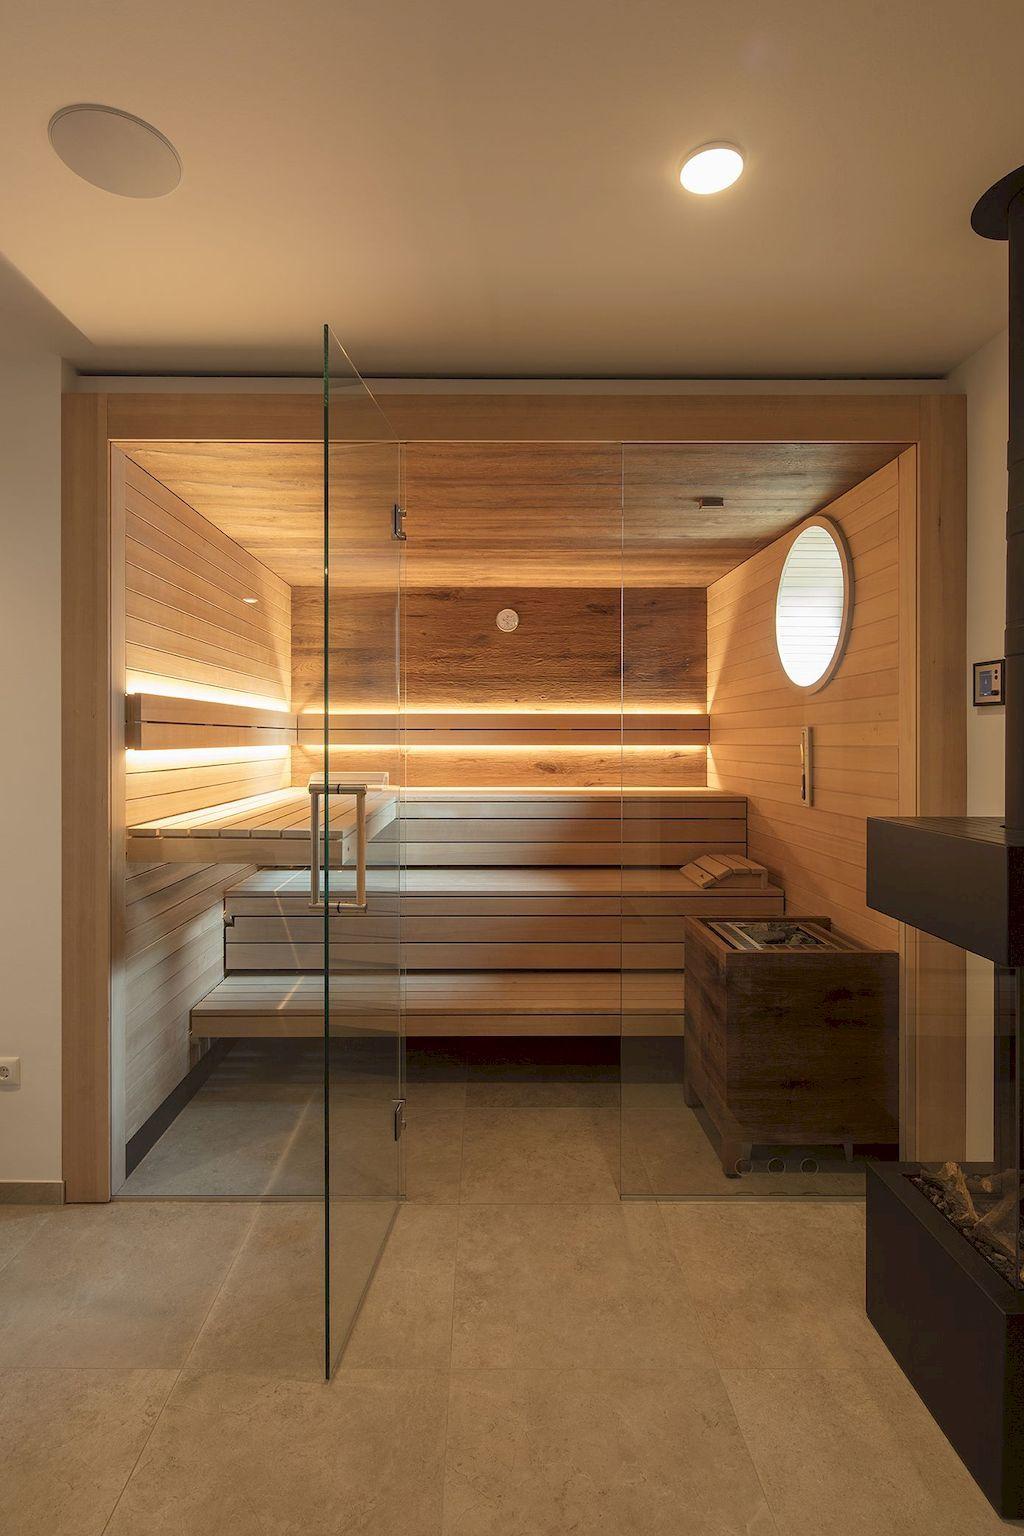 Astonishing Calm Down With Household And Mates In Your House Sauna In 2020 Sauna Design Sauna Diy Bathroom Interior Design